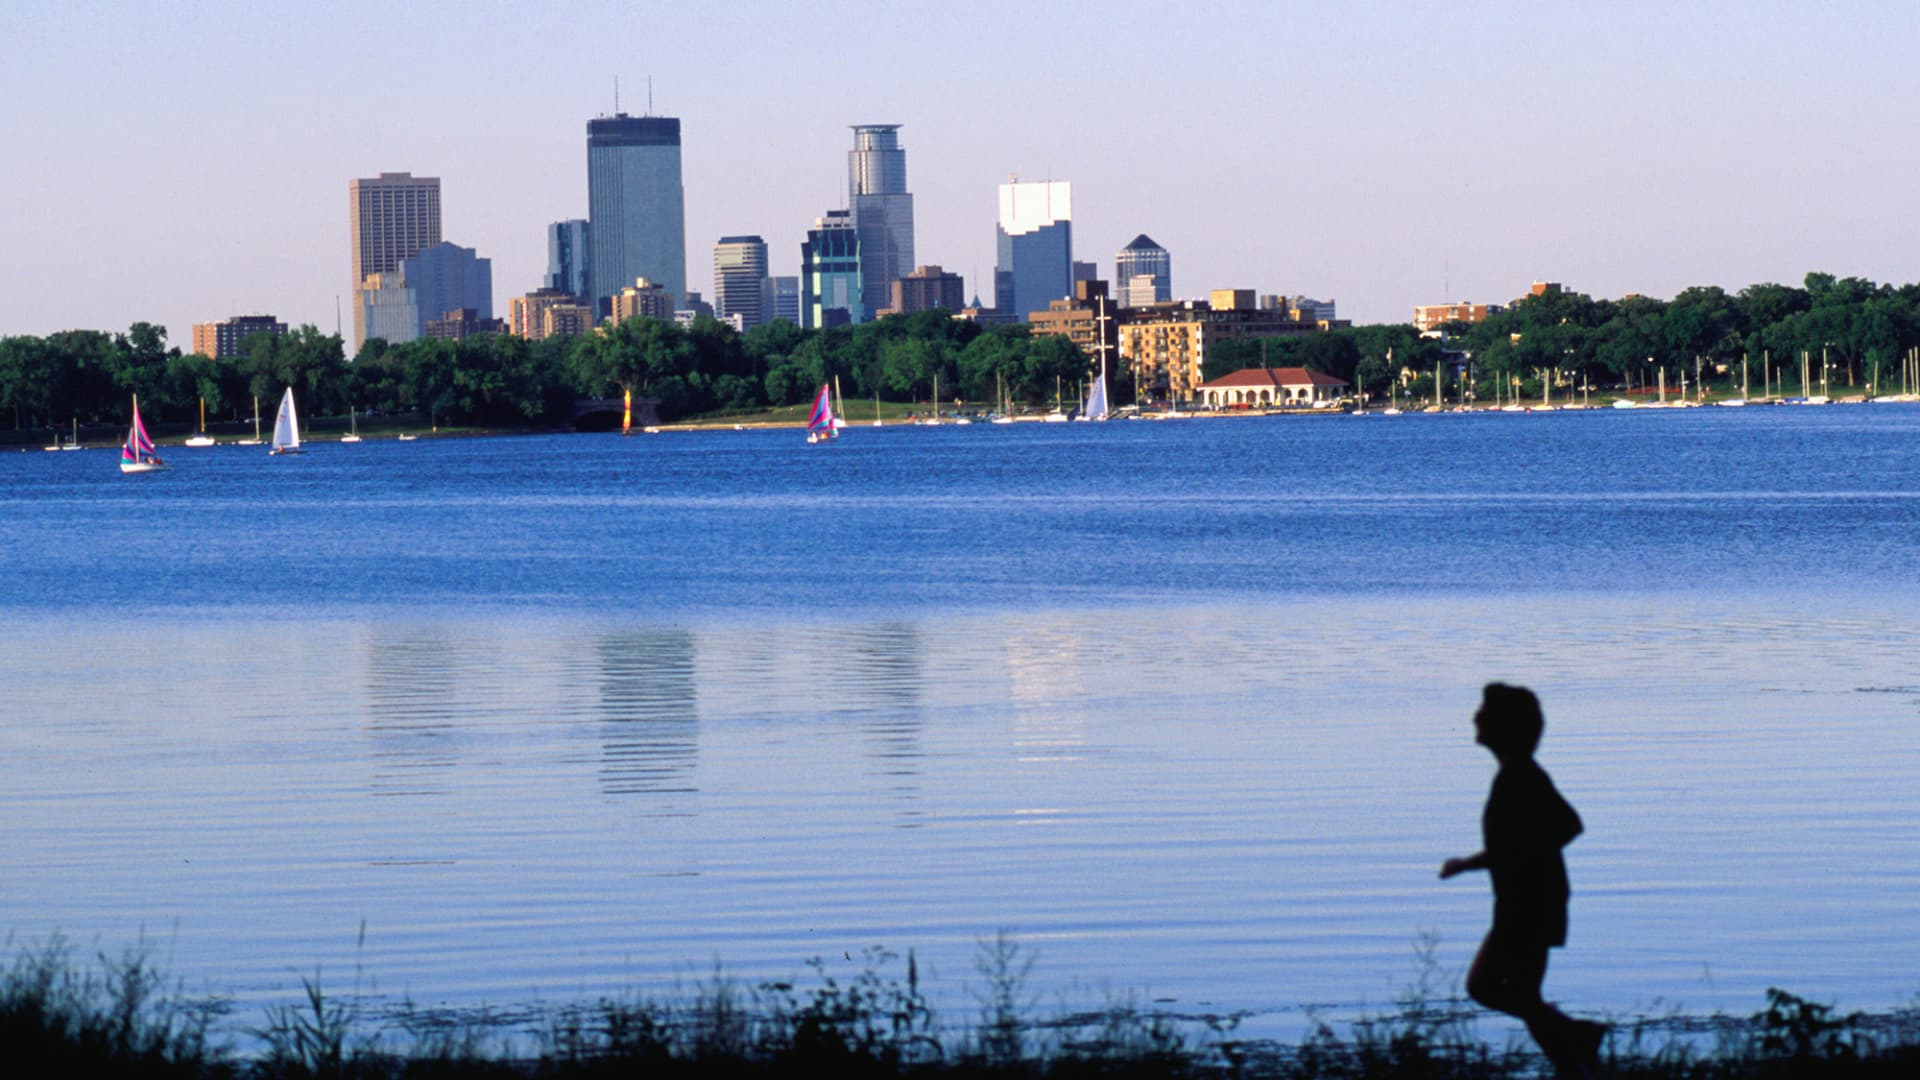 An early morning jog around Lake Bde Maka Ska, St. Paul, Minnesota.